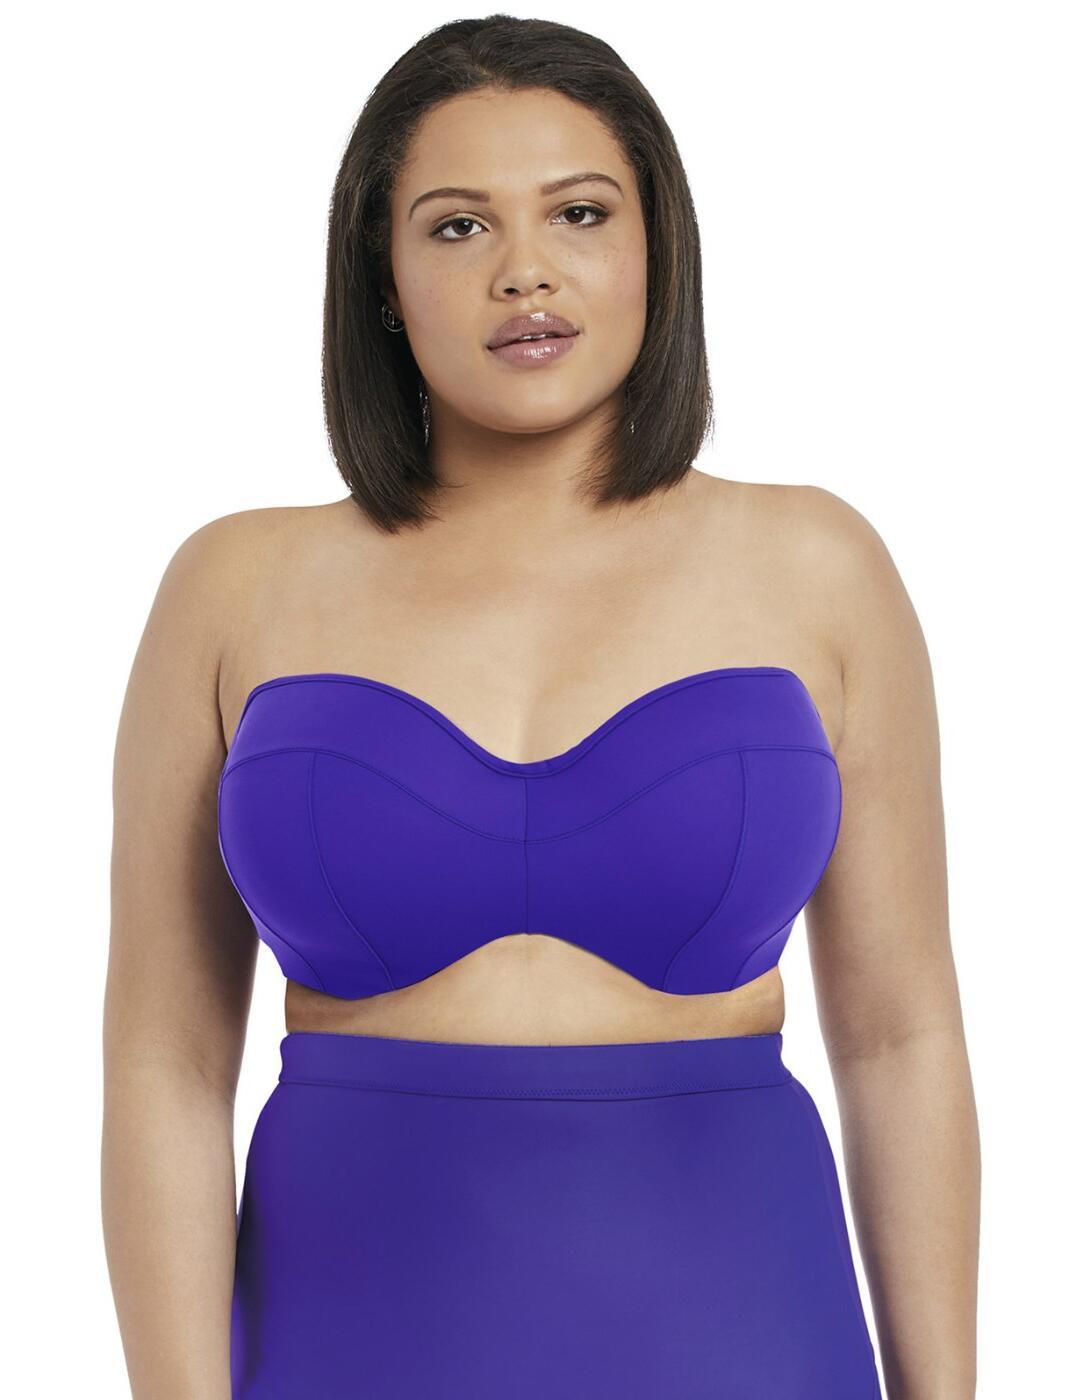 7532 Elomi Essentials Underwired Bandeau Bikini Top - 7532 Indigo